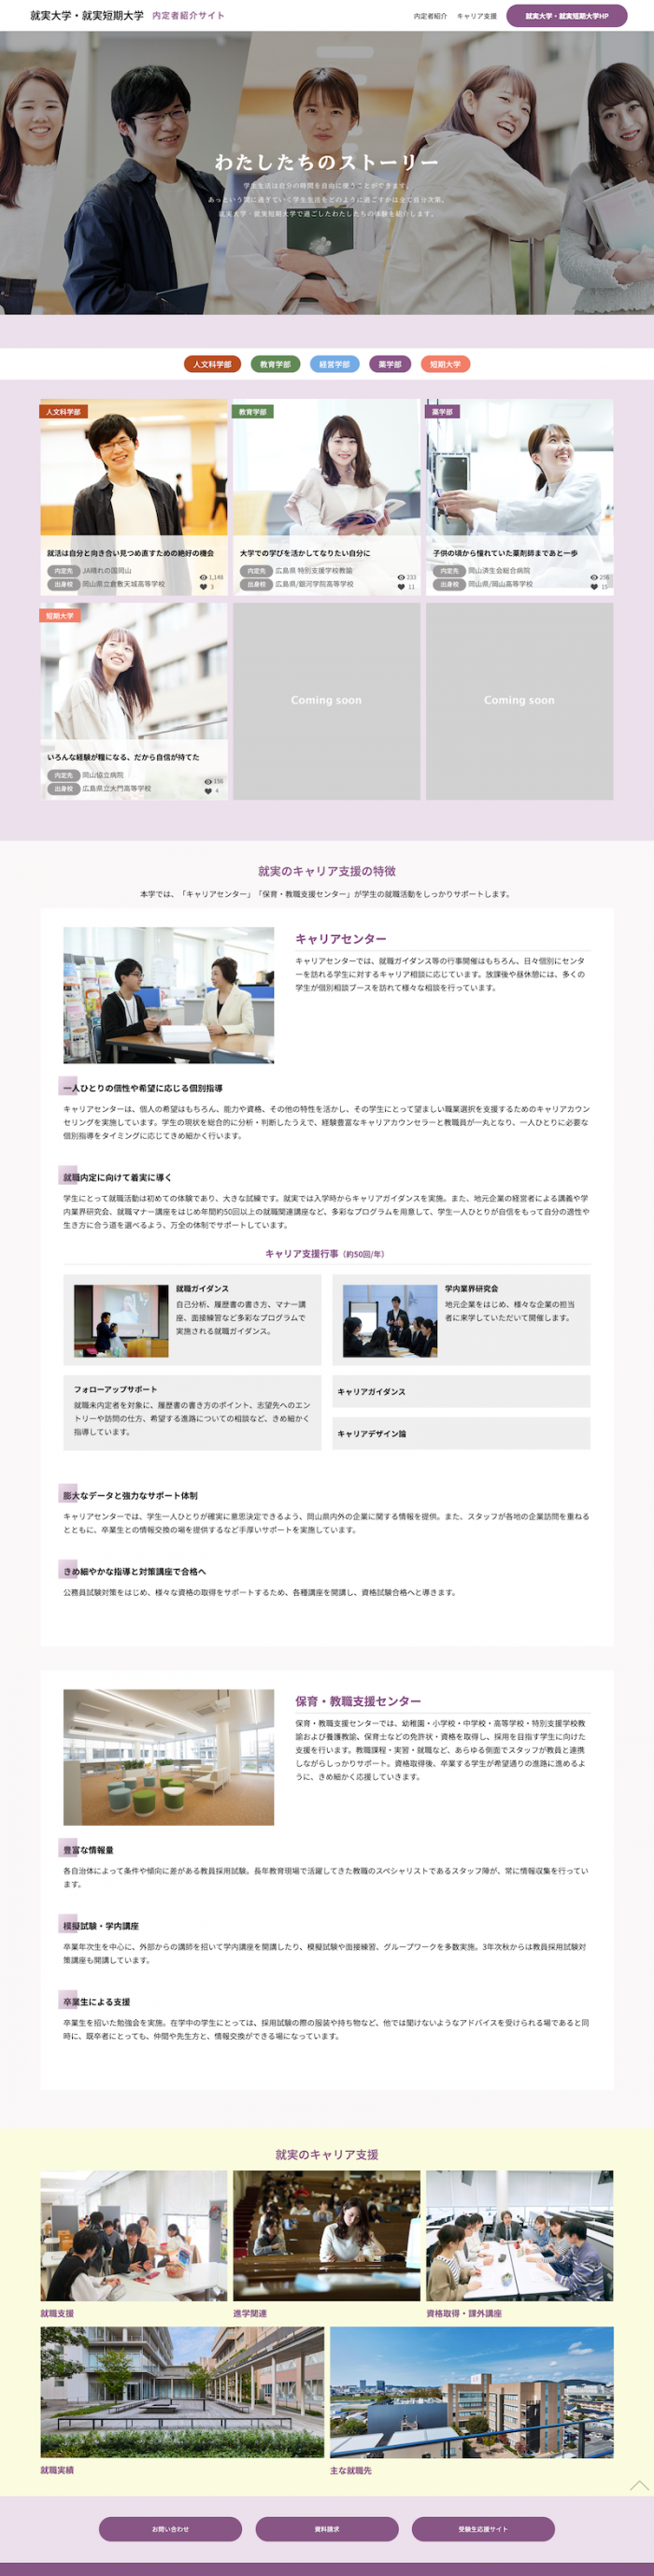 就実大学・就実短期大学 内定者紹介サイトの制作